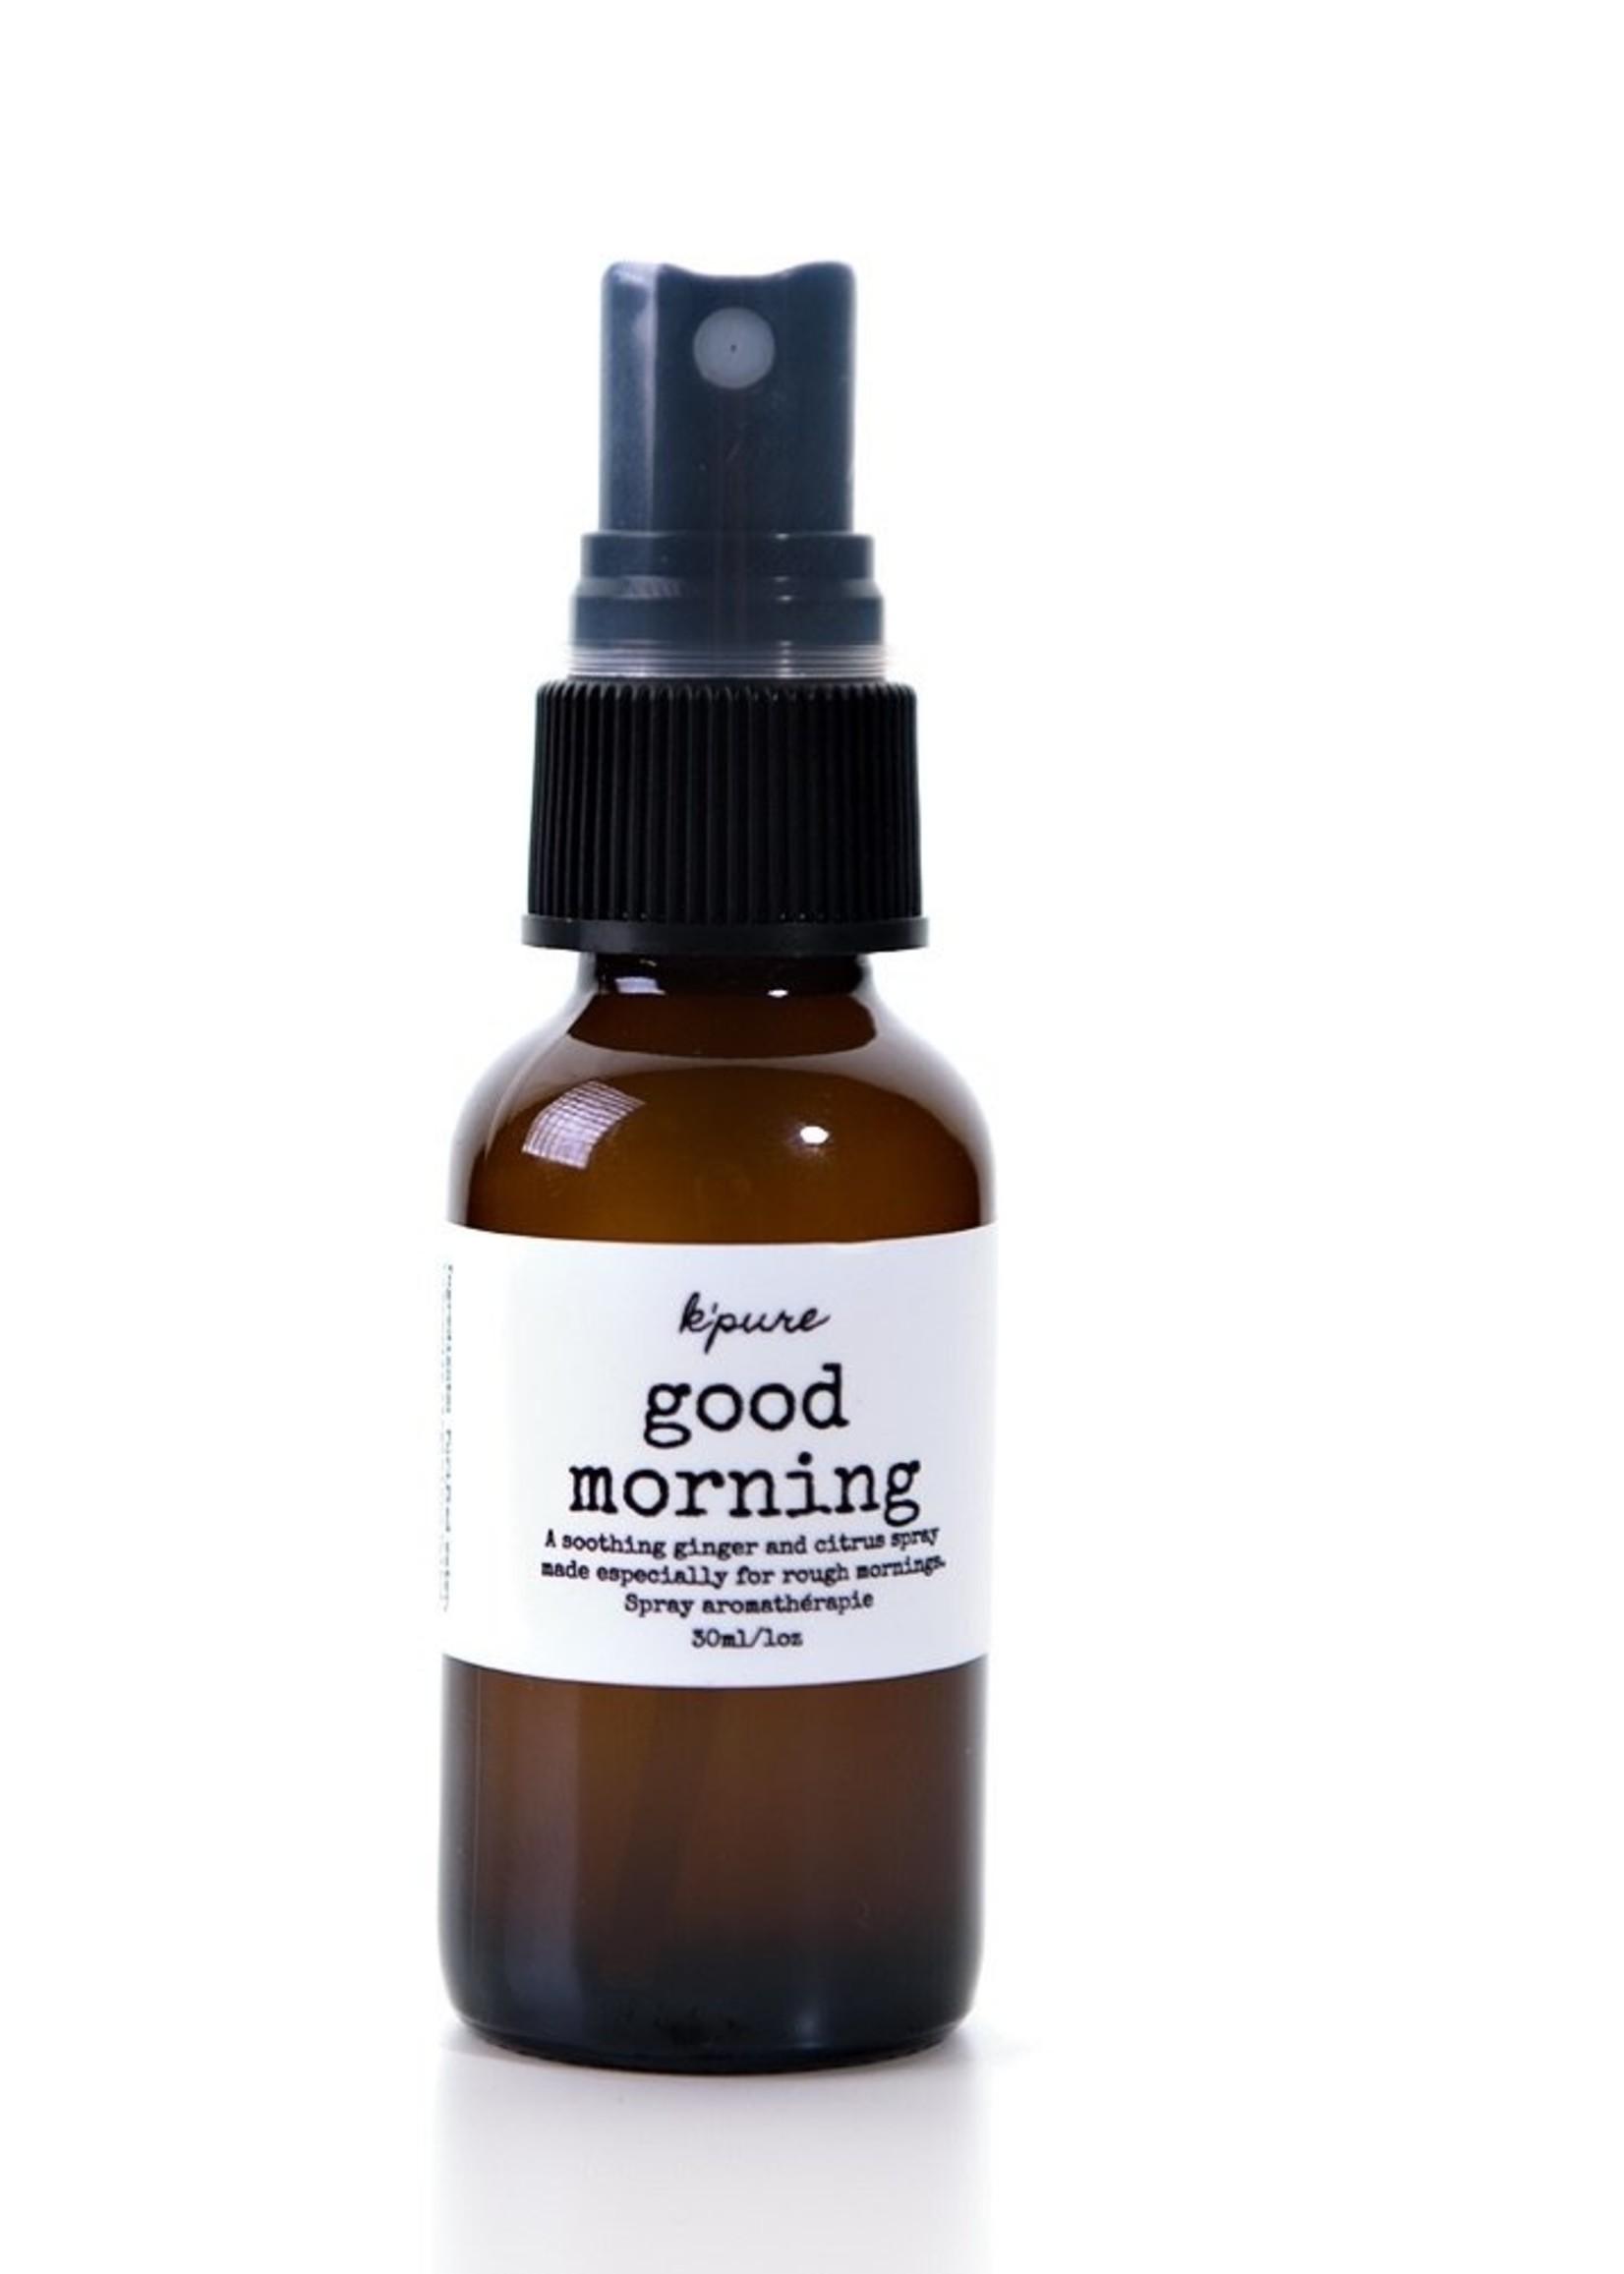 K'PURE GOOD MORNING Essential Oil Spray 1oz